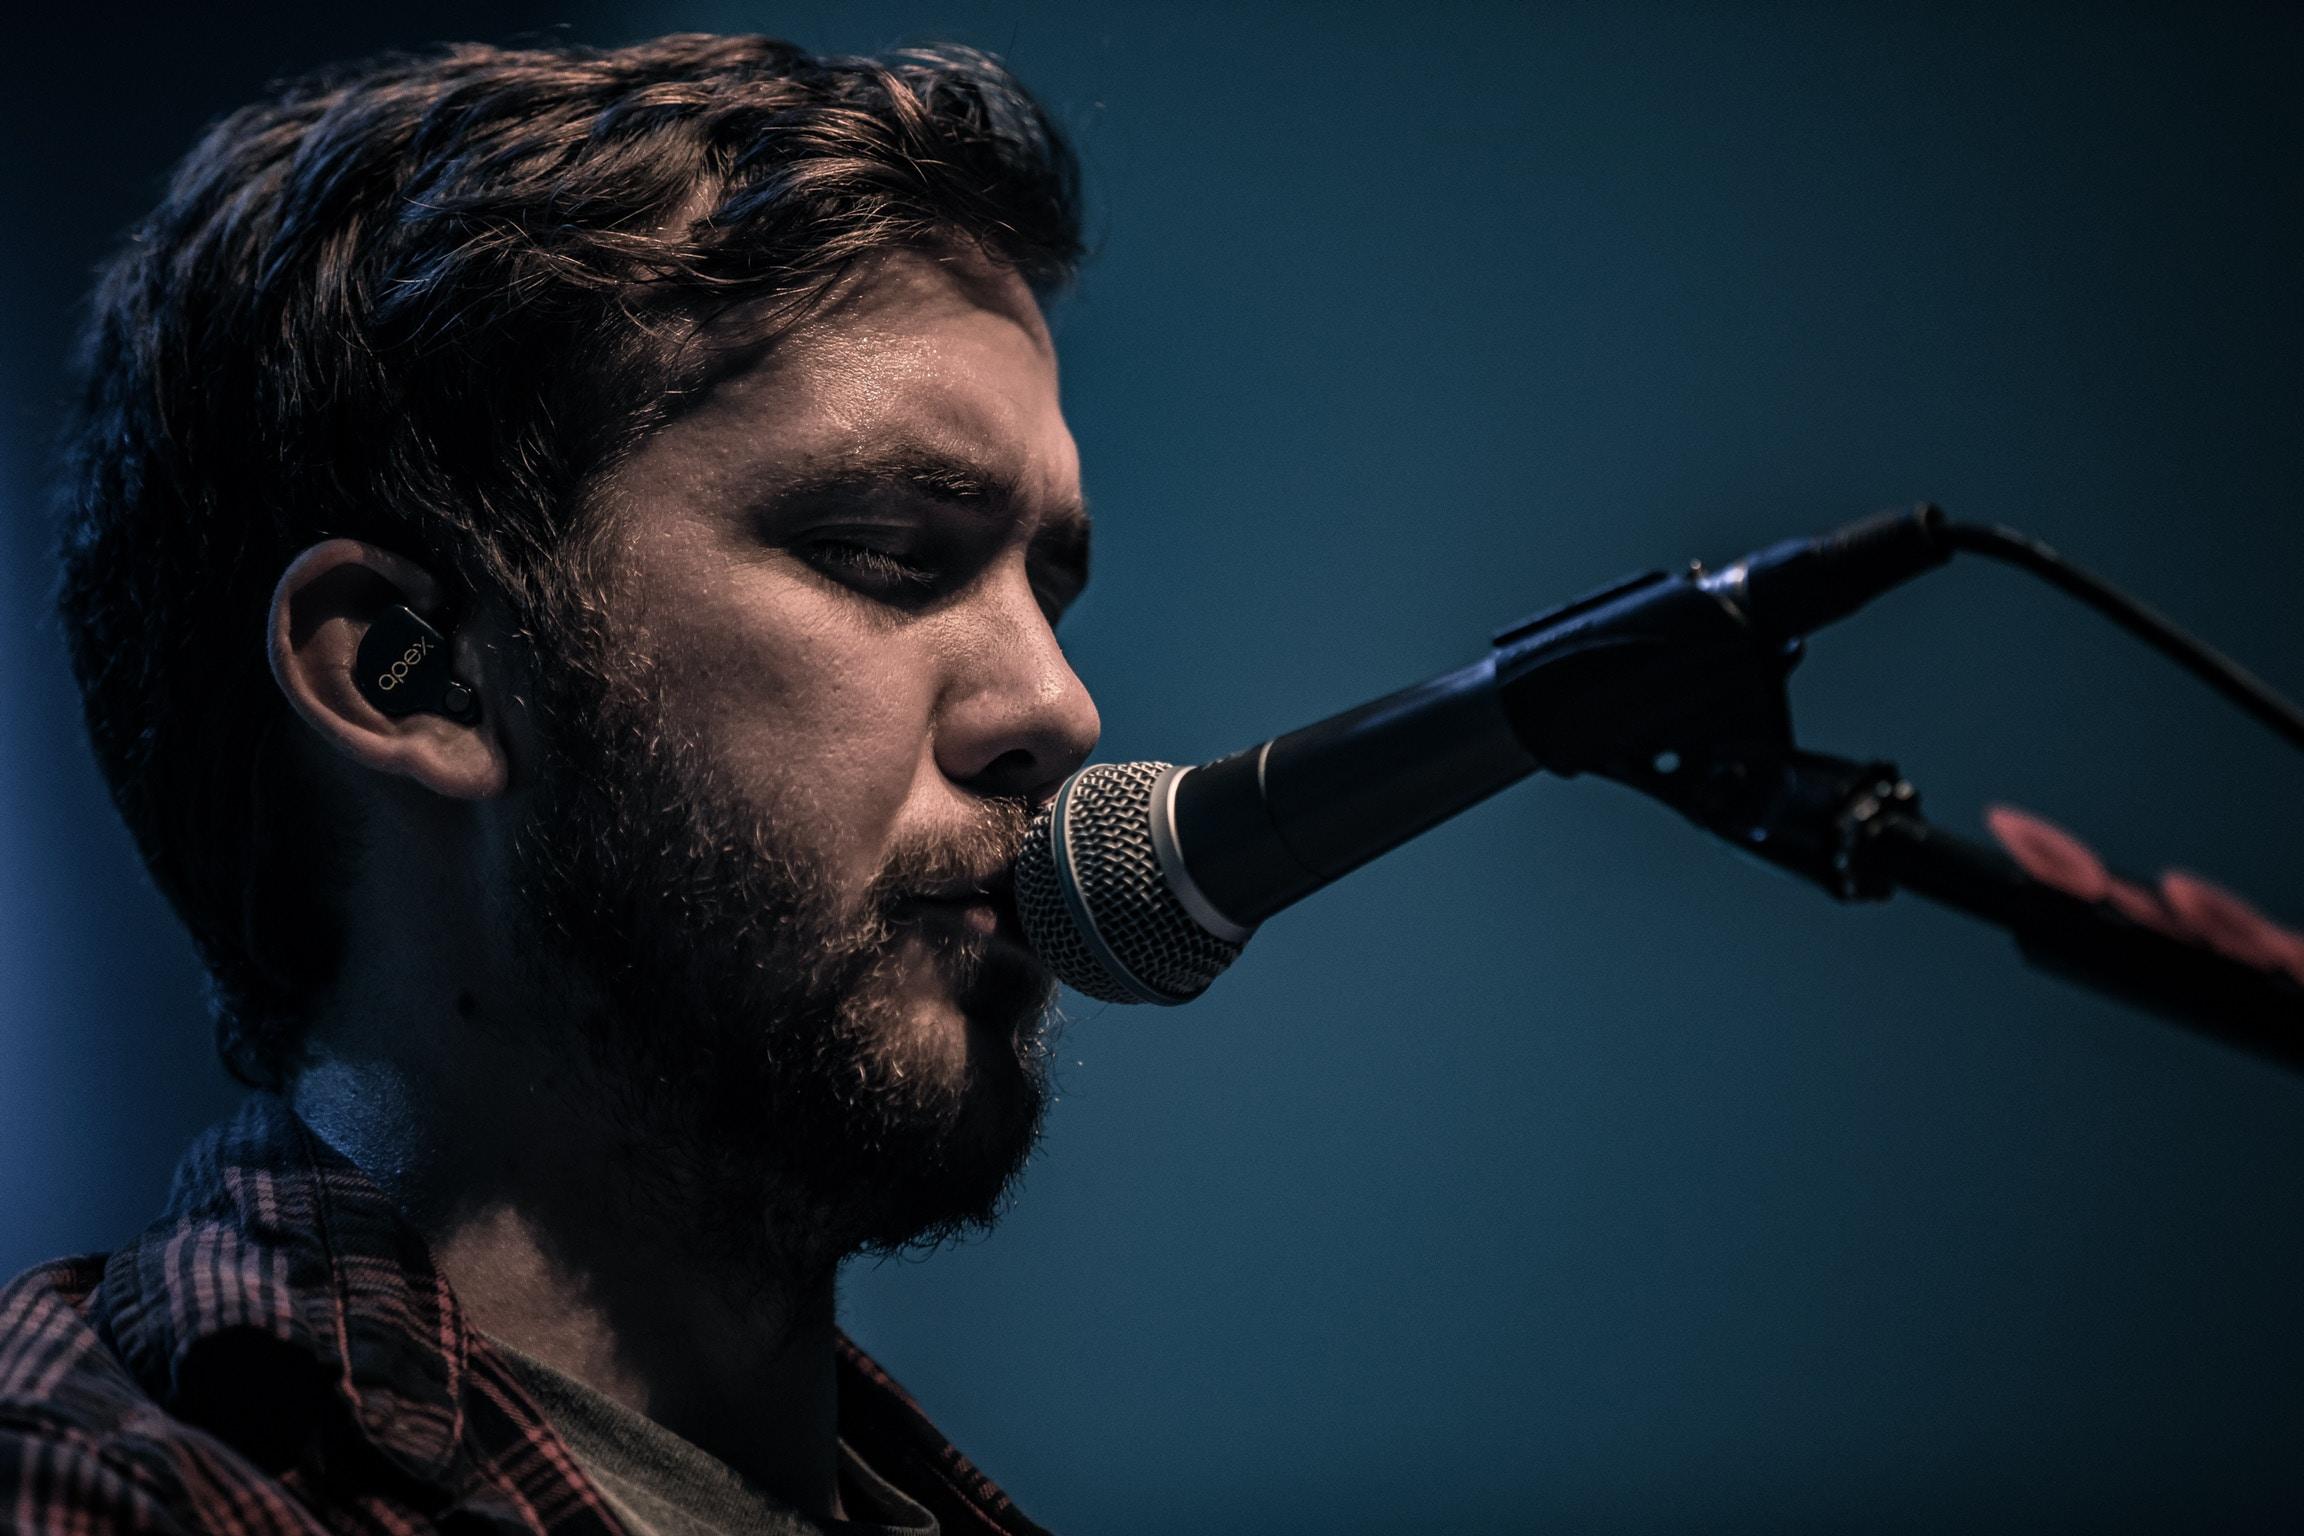 man singing close-up photography